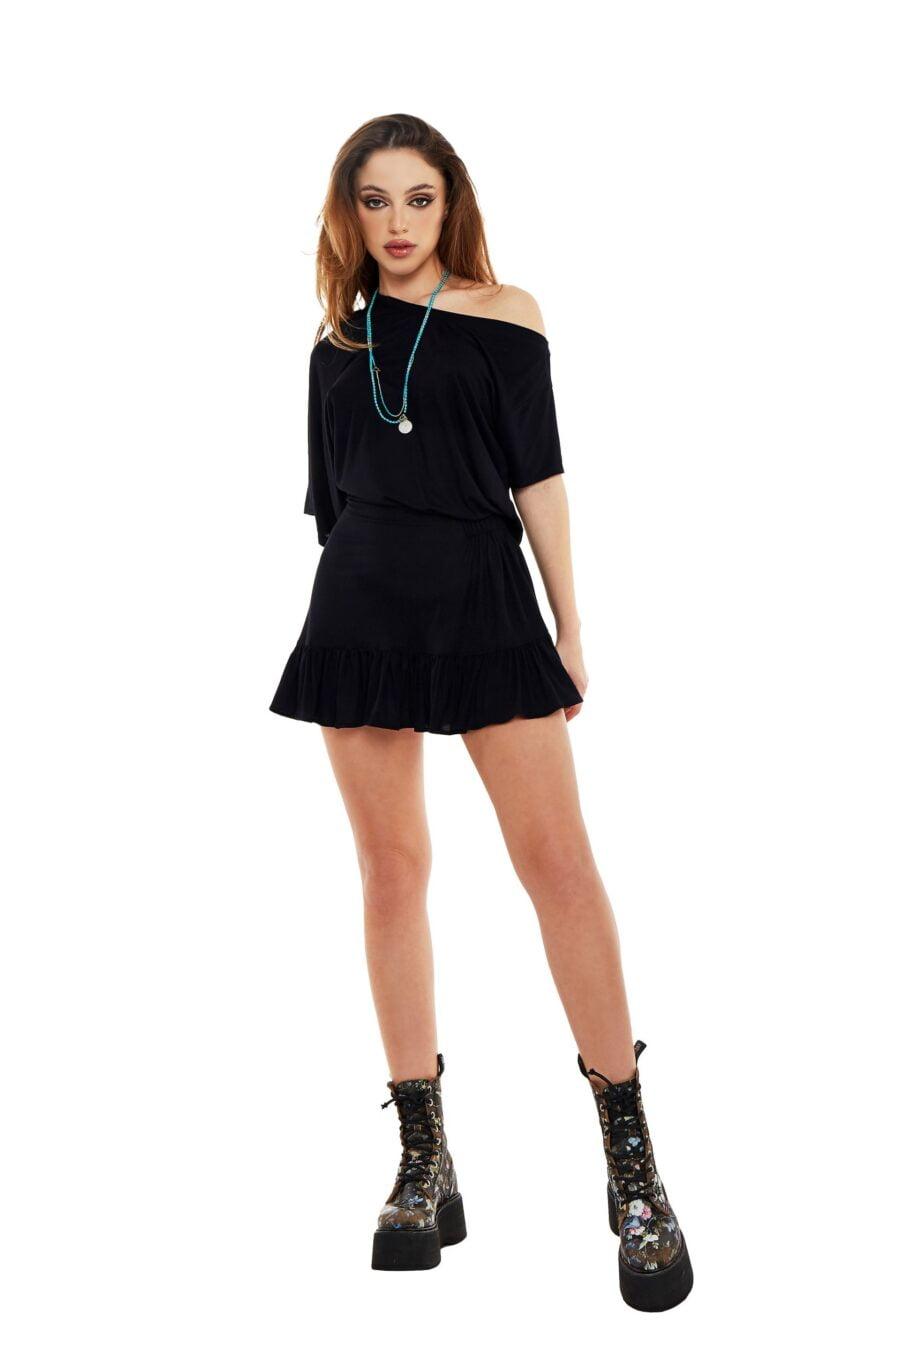 Black dress with dropped shoulder